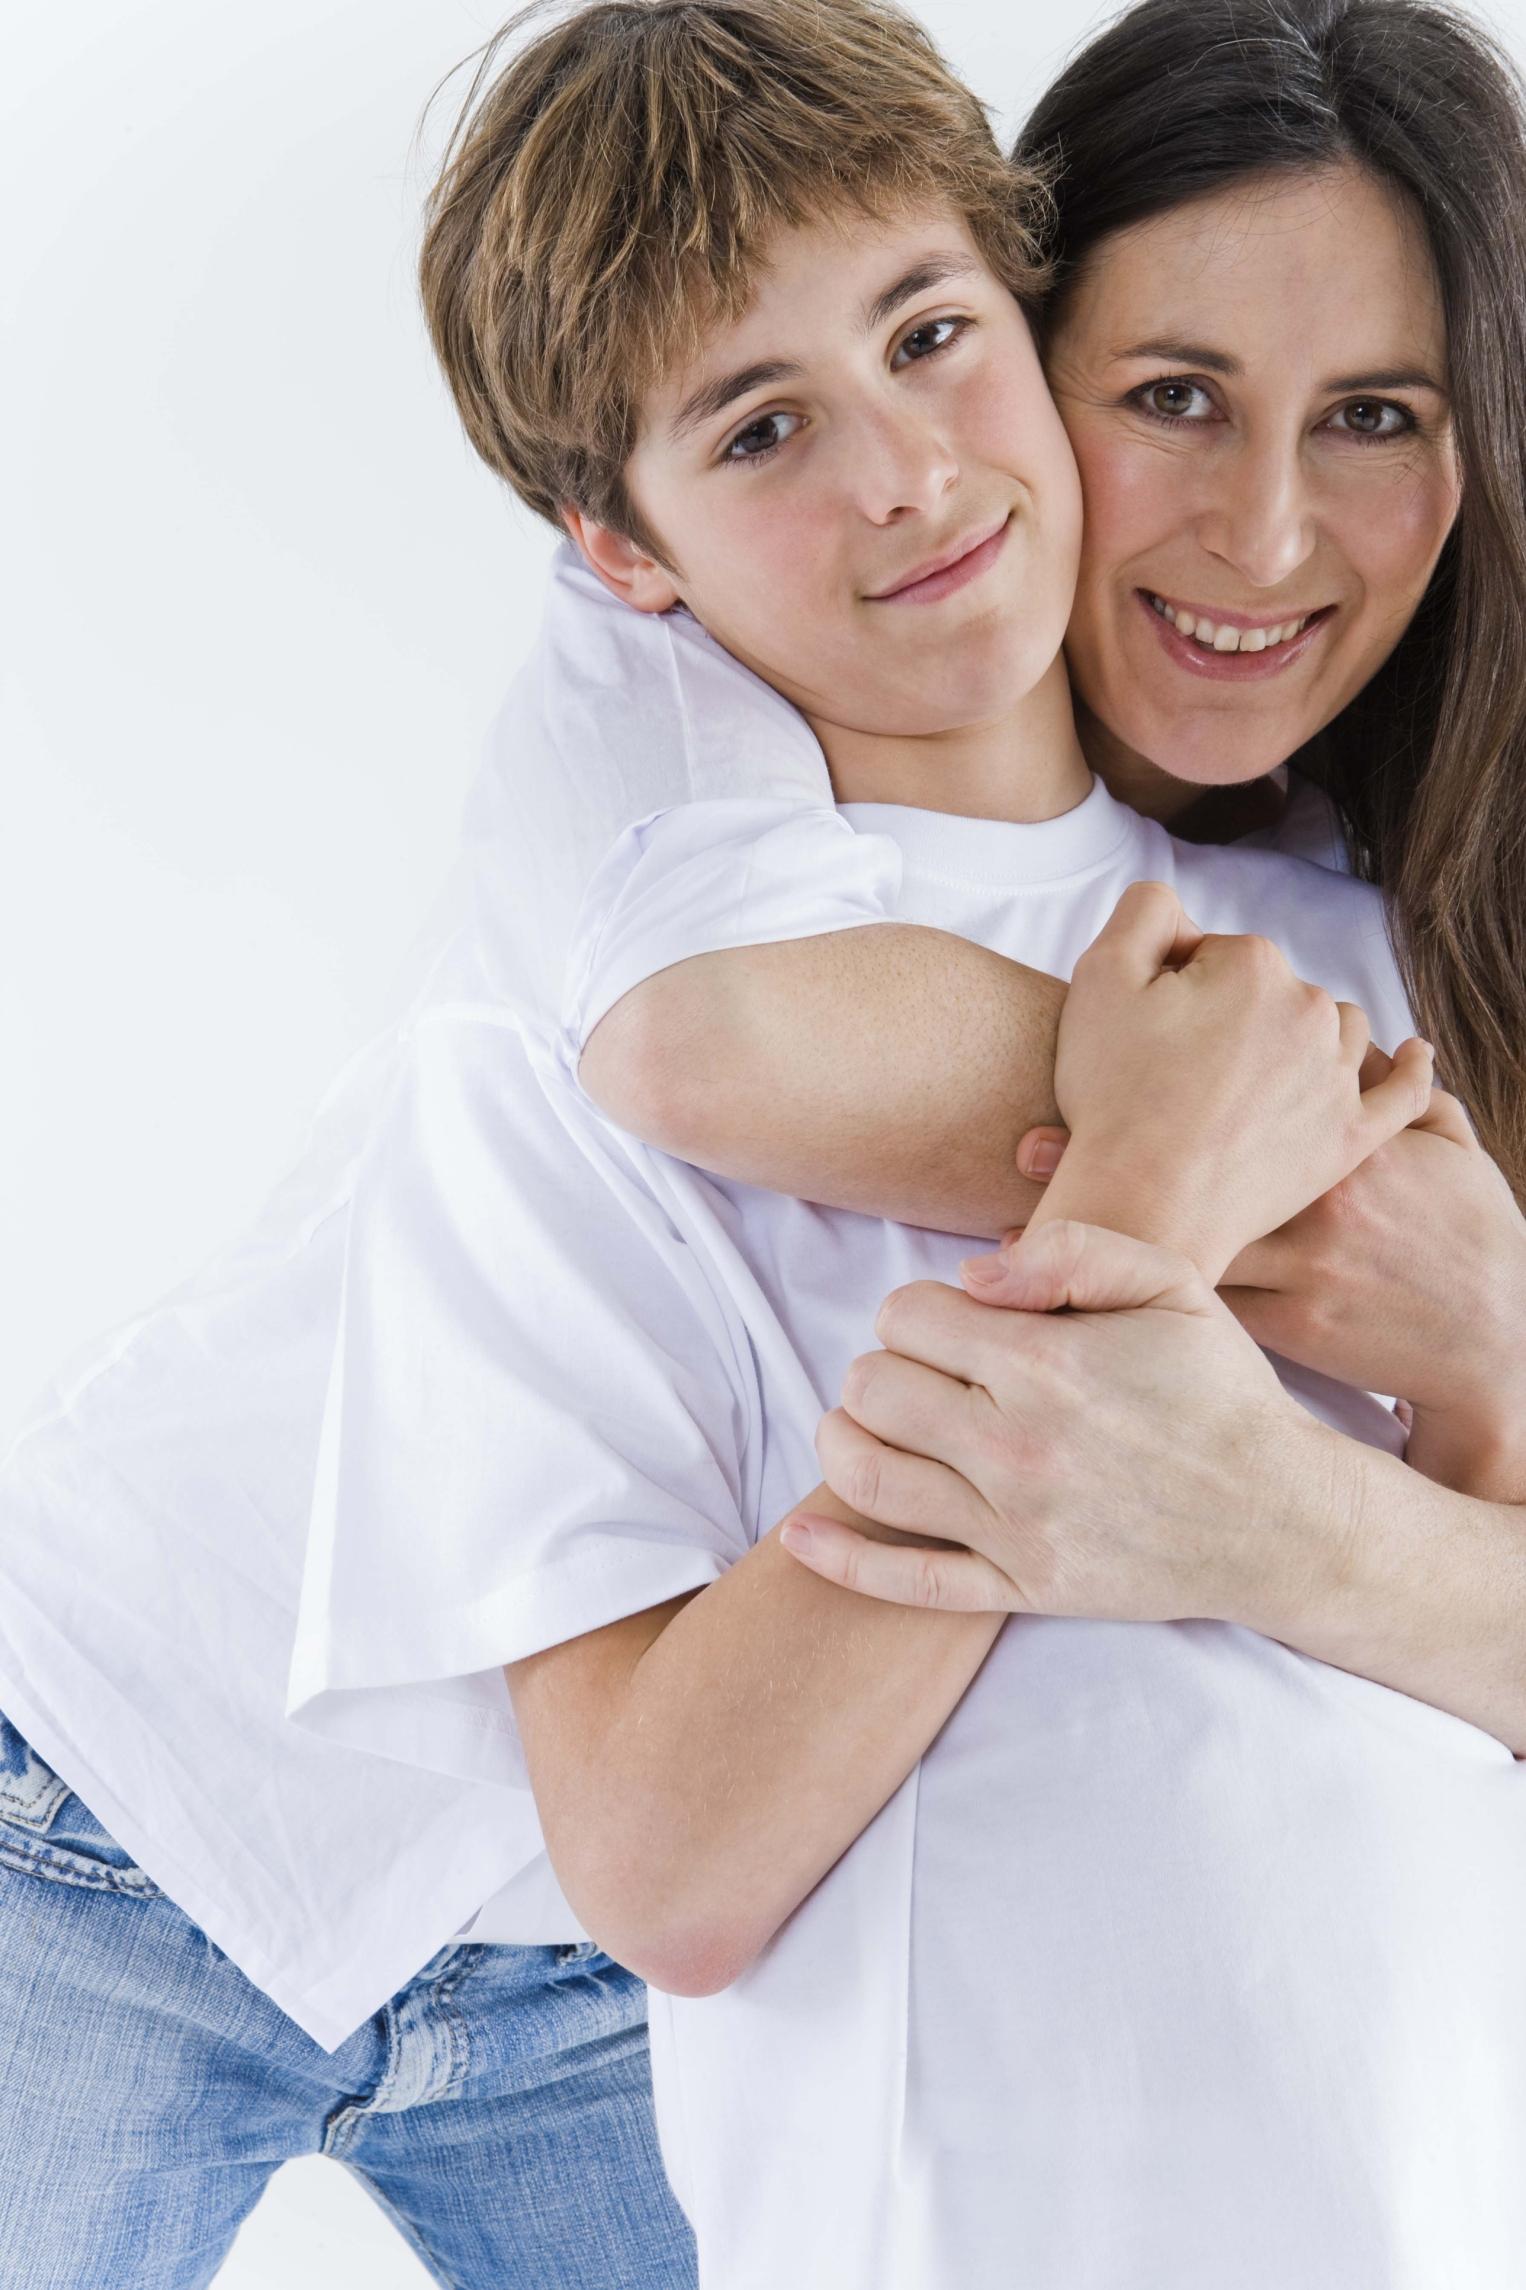 Authoritarian And Authoritative Parenting Styles